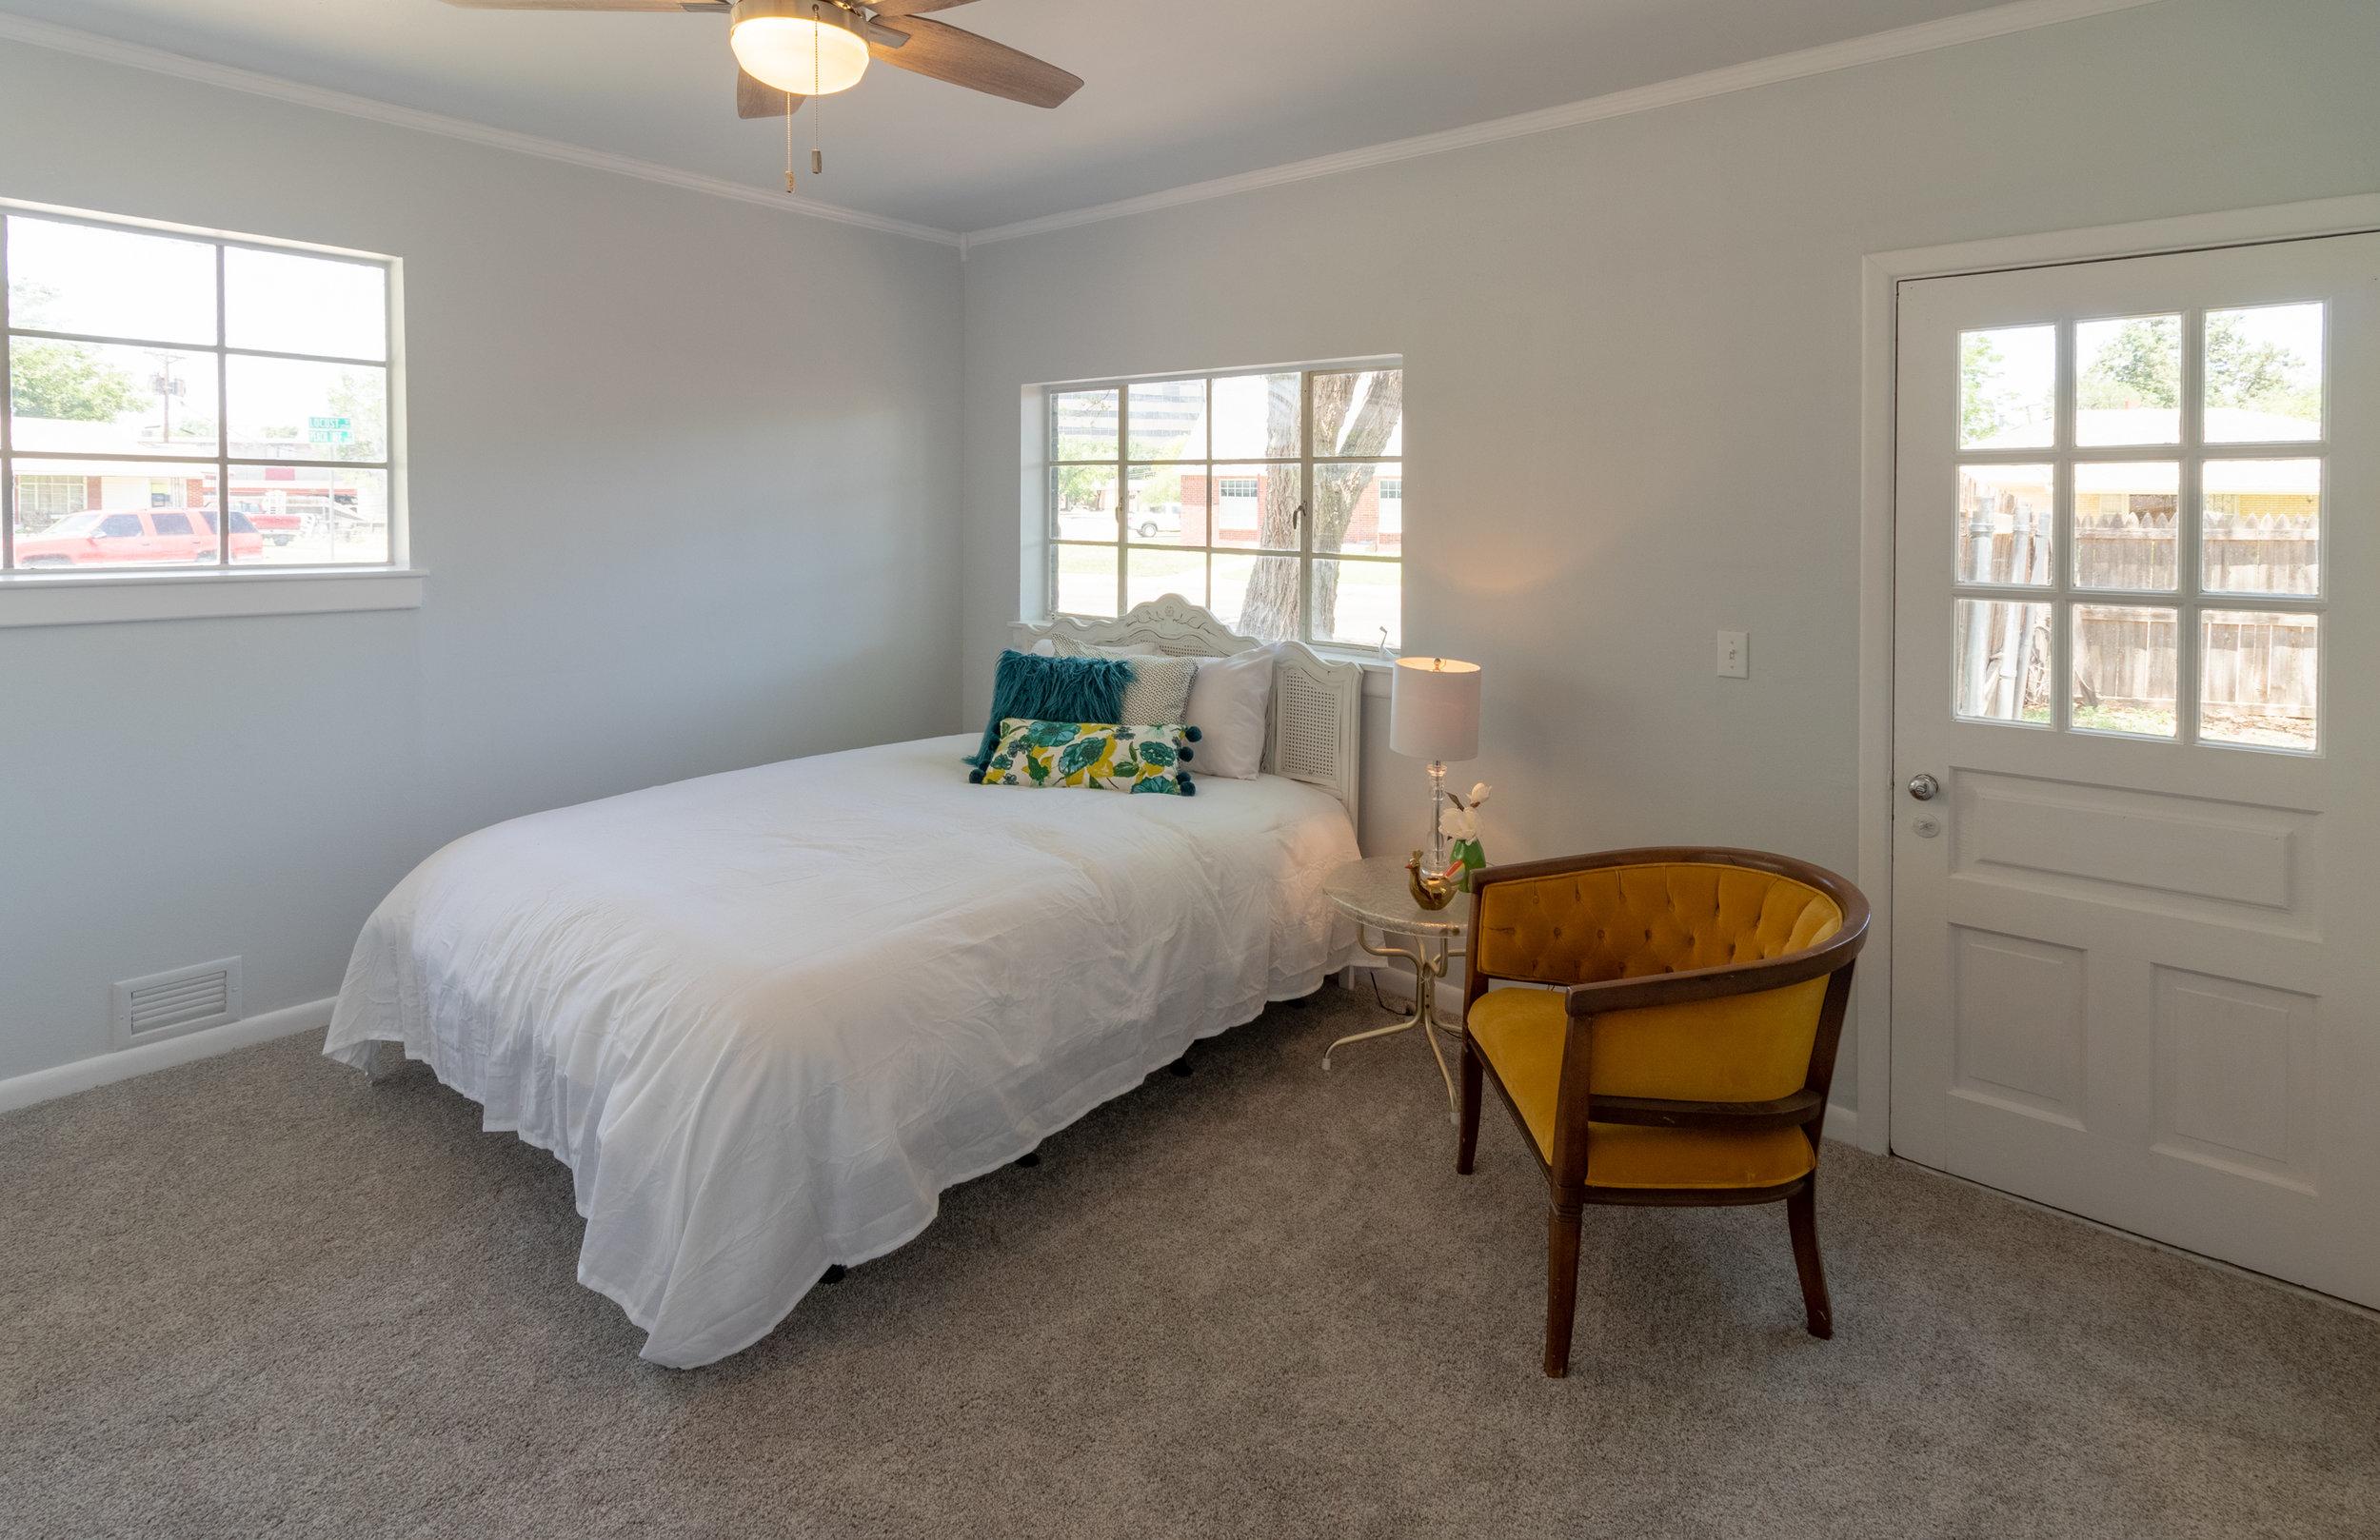 19 - 3rd Bedroom 1.jpg